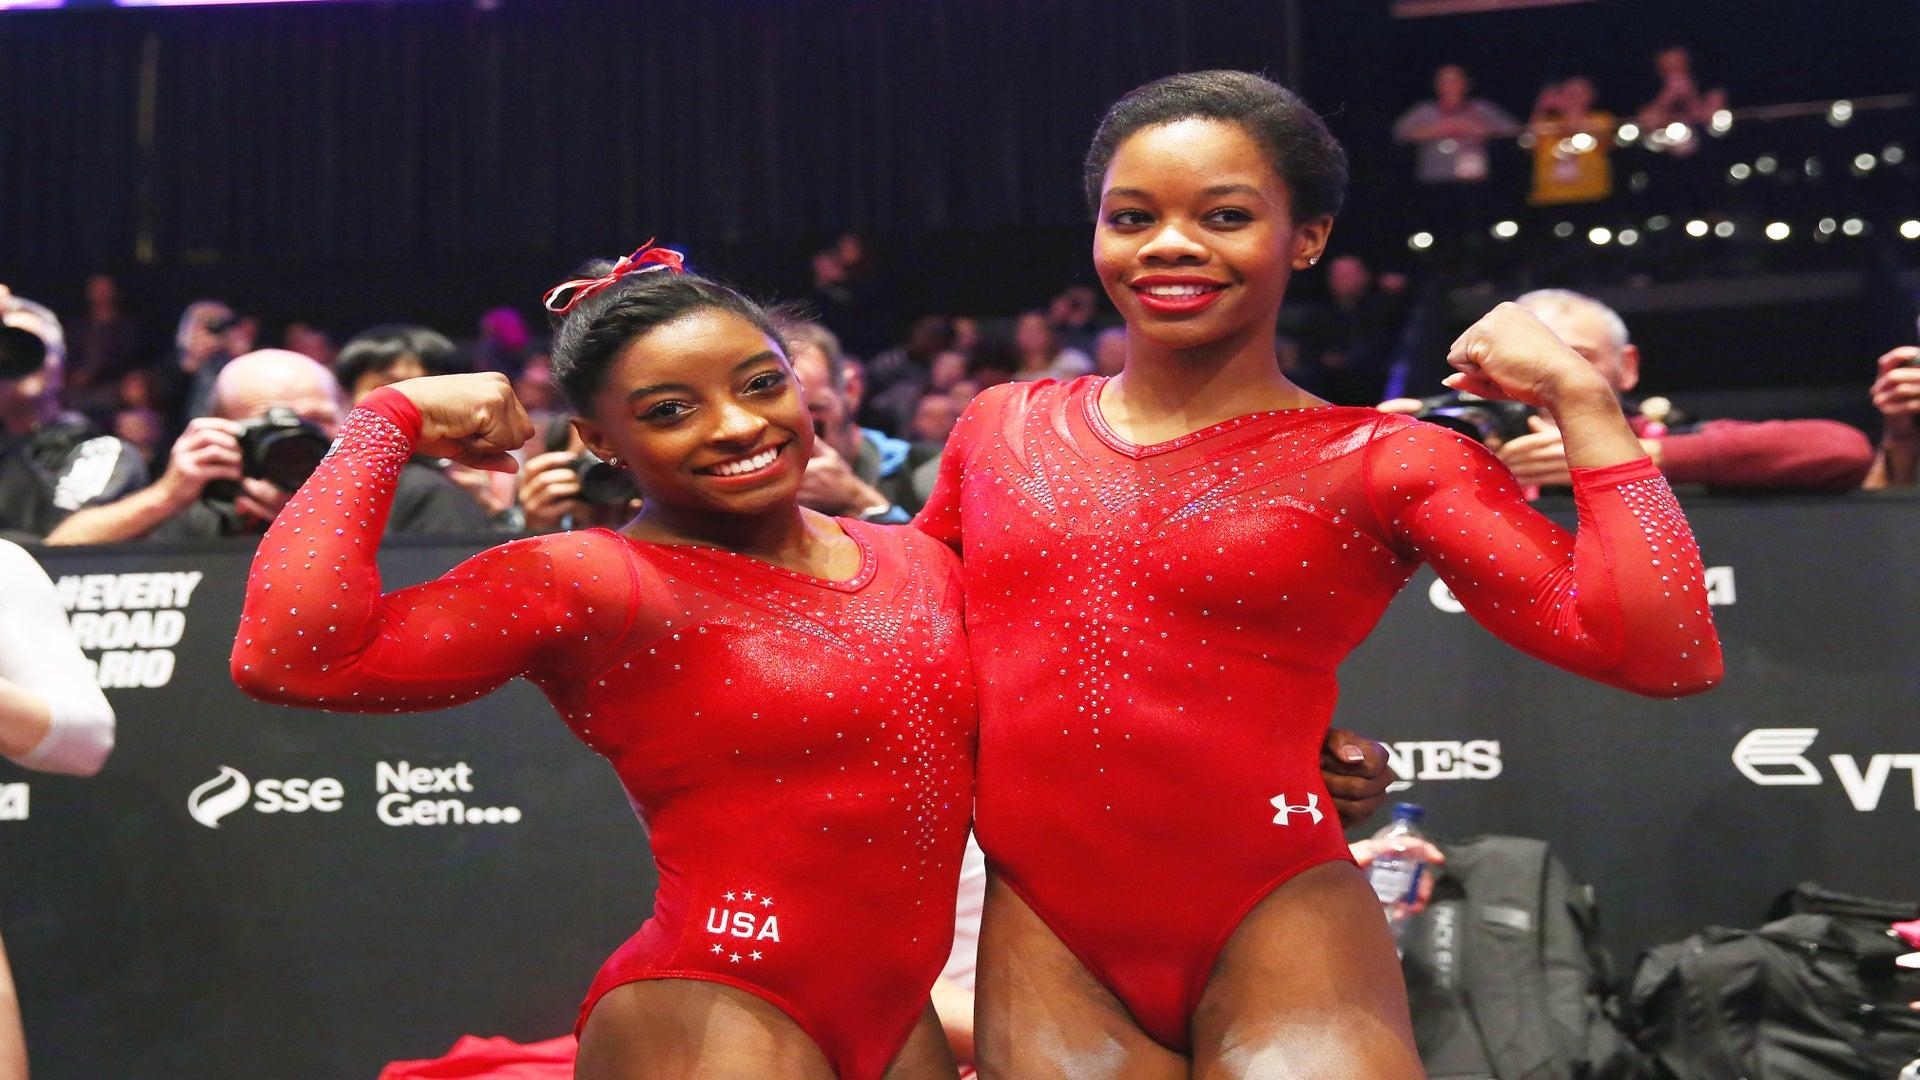 Simone Biles and Gabby Douglas are Headed to Rio